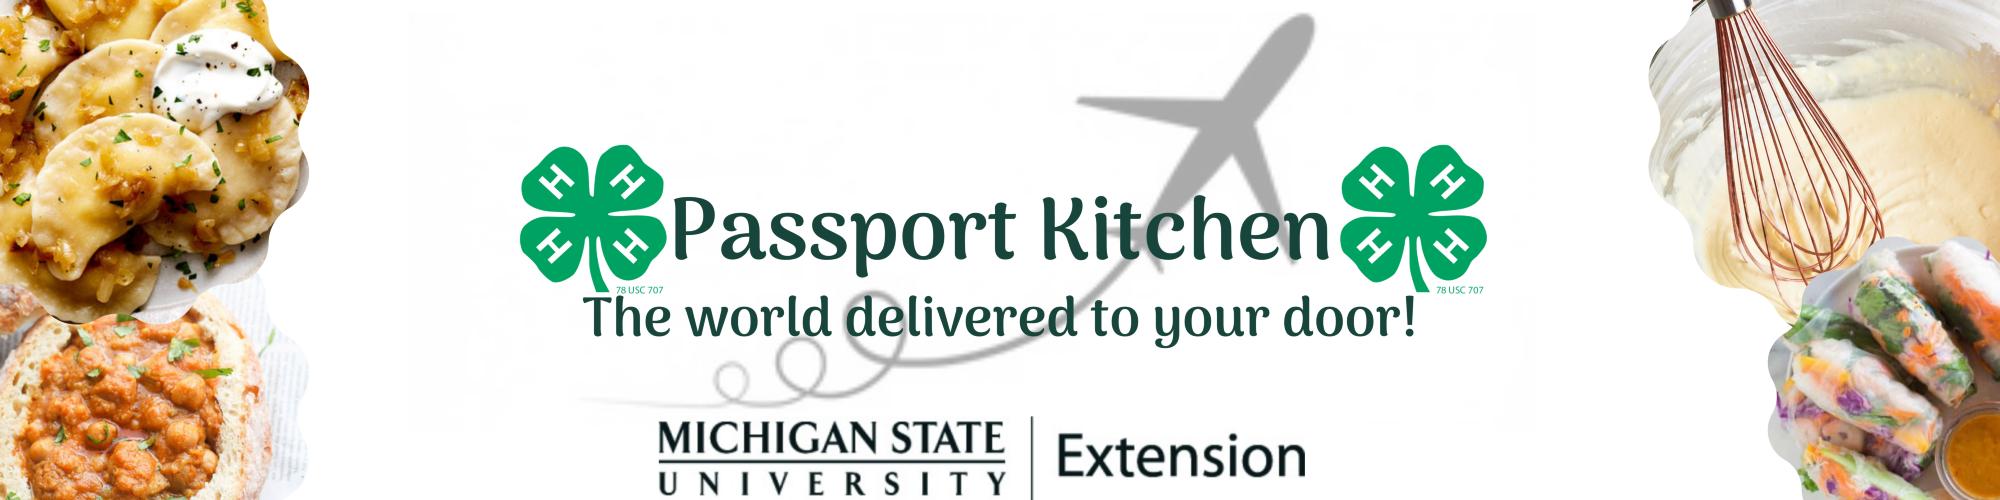 Passport Kitchen the World delivered to your door.